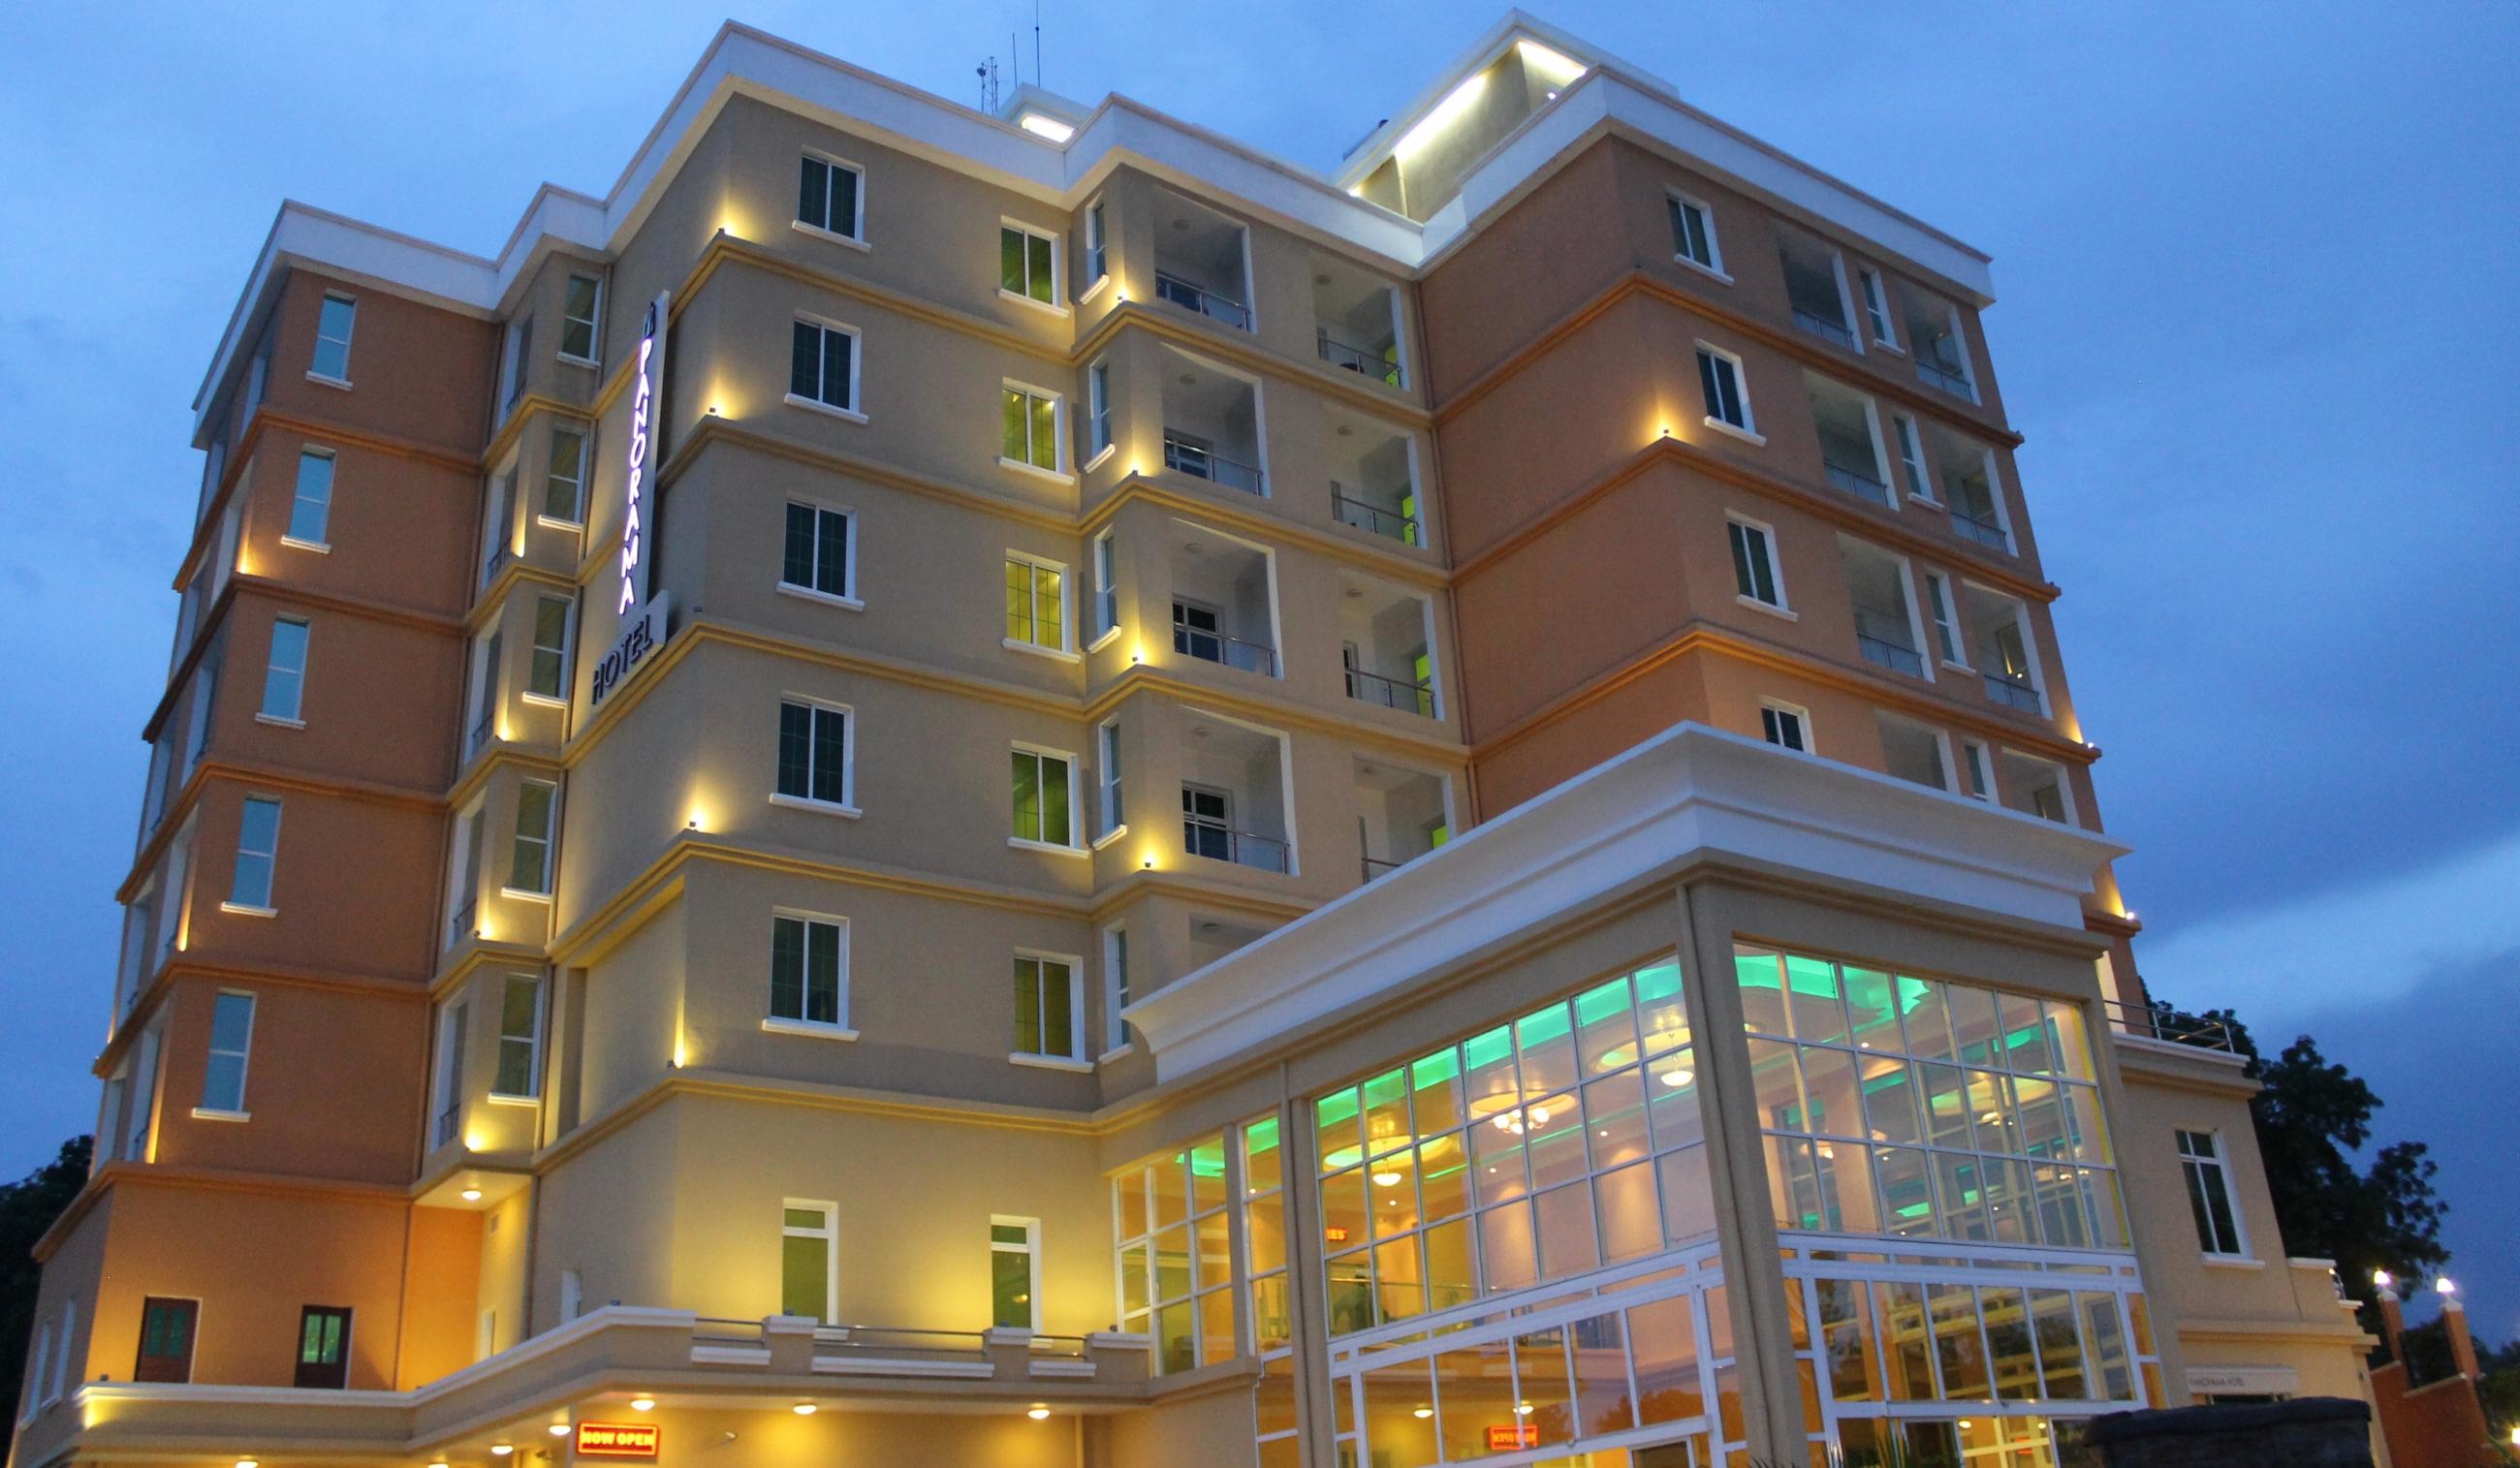 sarovar hotels india africa mumbai hotel management grow looks plans african